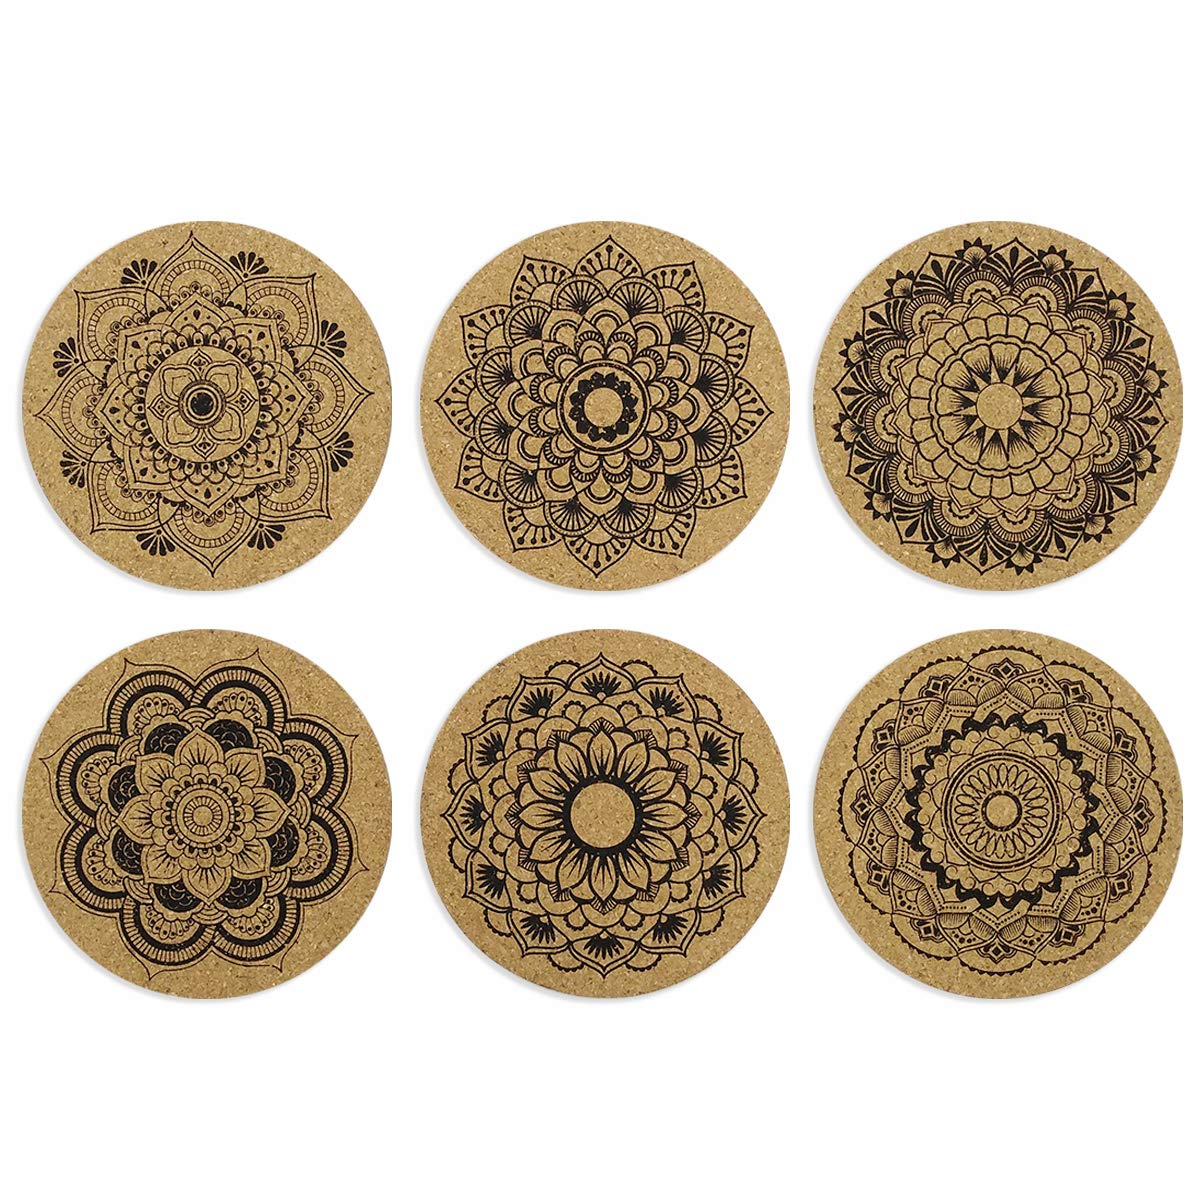 Mandala Cork Coasters for Drinks, Cork Coasters Absorbent Reusable Cup Mat Round Edge Coaster–Set of 6